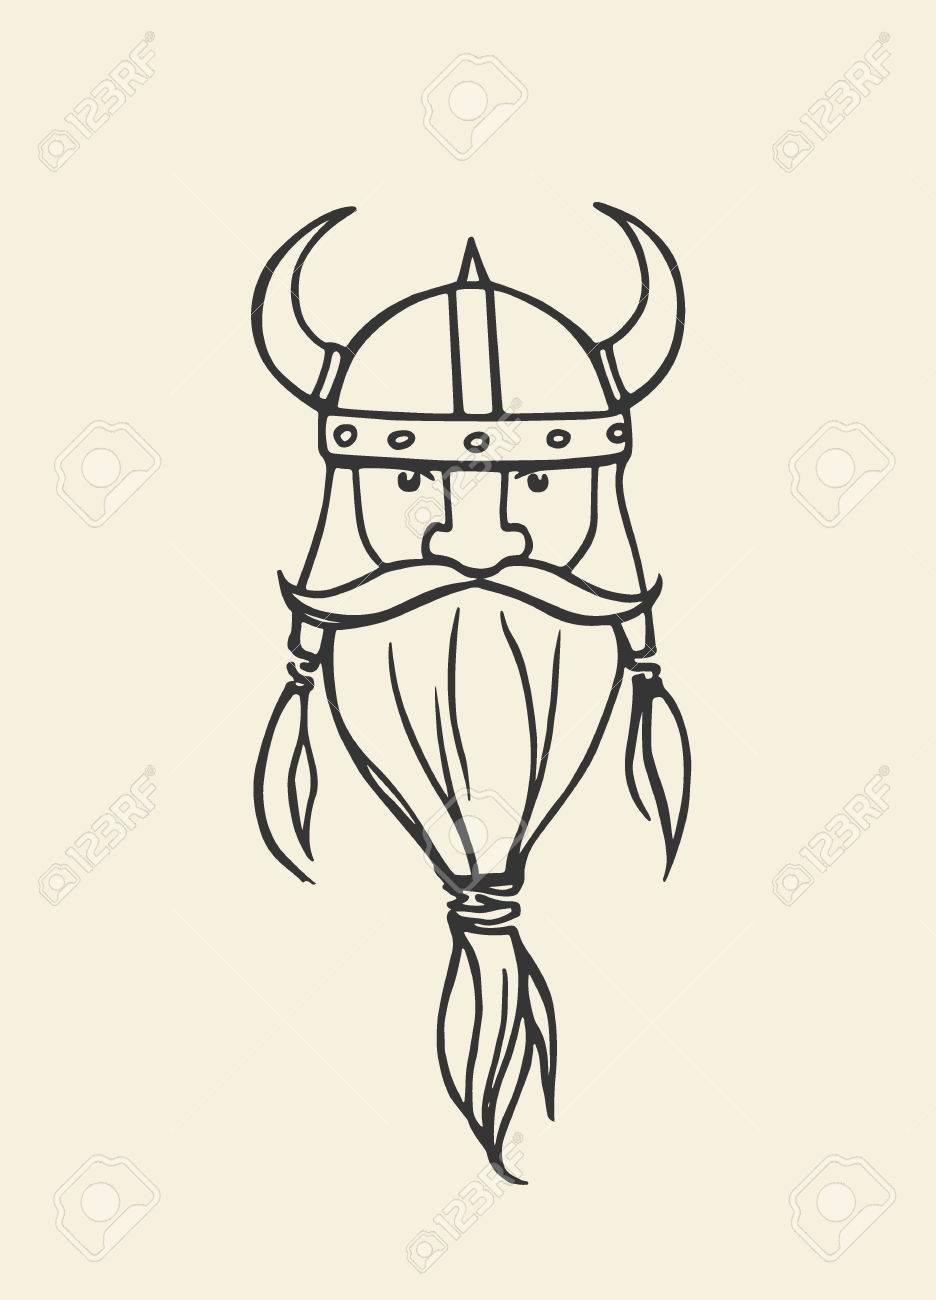 936x1300 Hand Drawn Head Of Bearded Viking With Helmet On. Vector